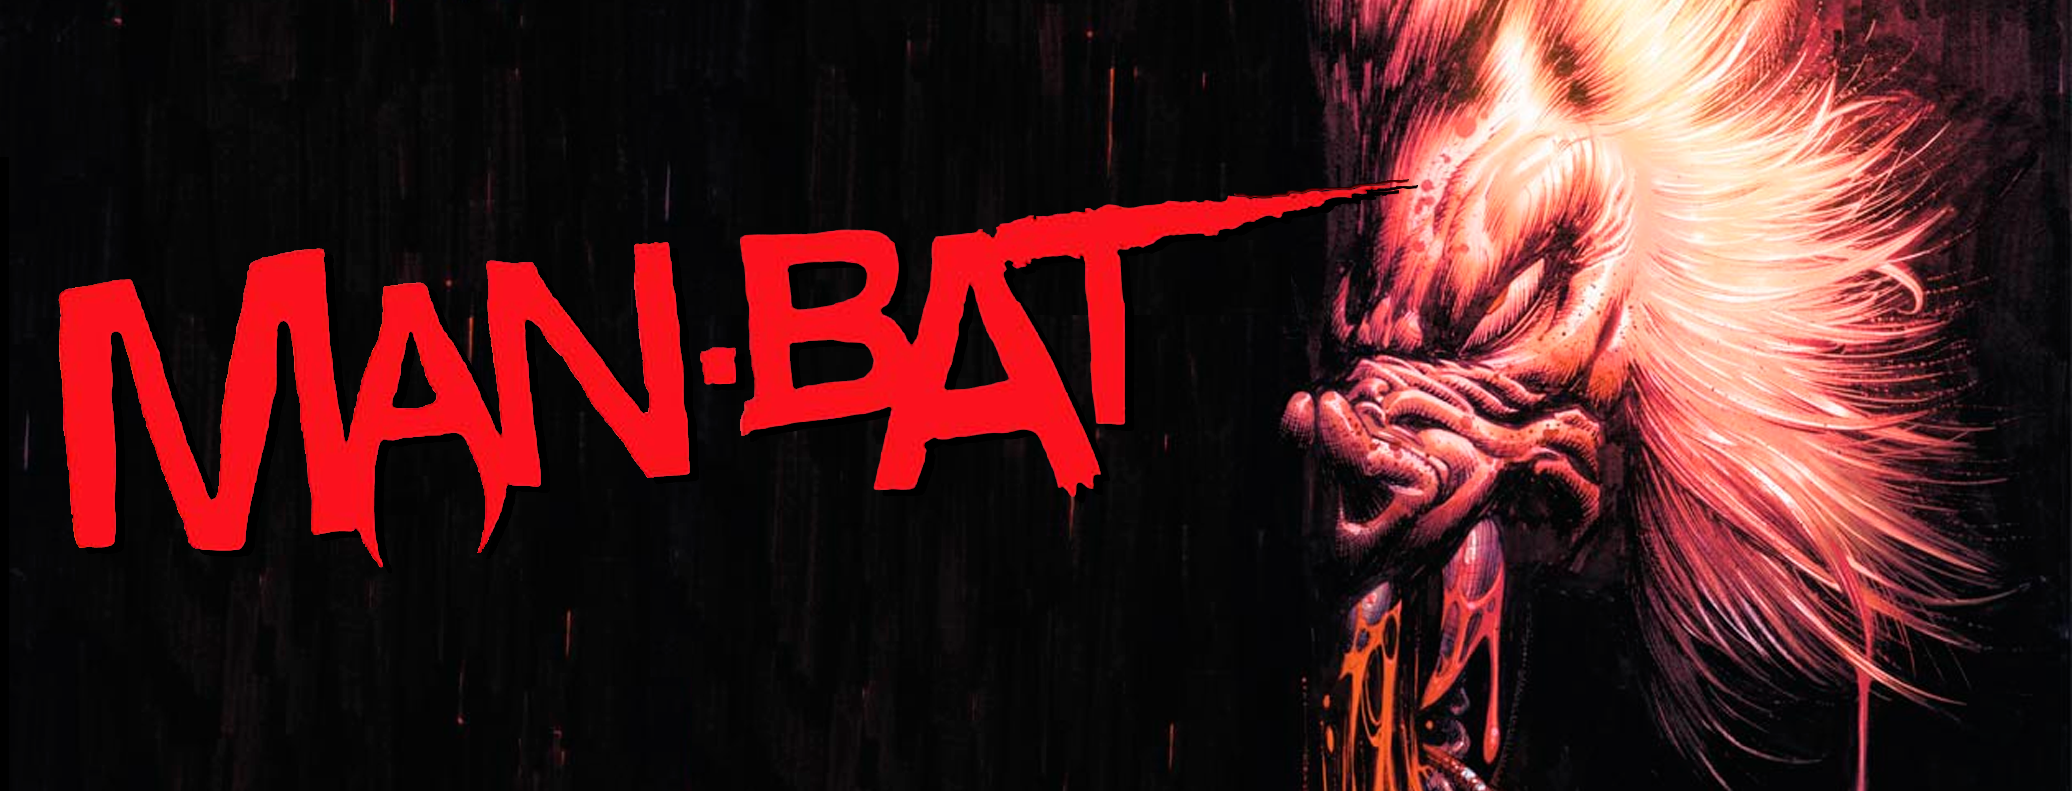 MAN BAT.png